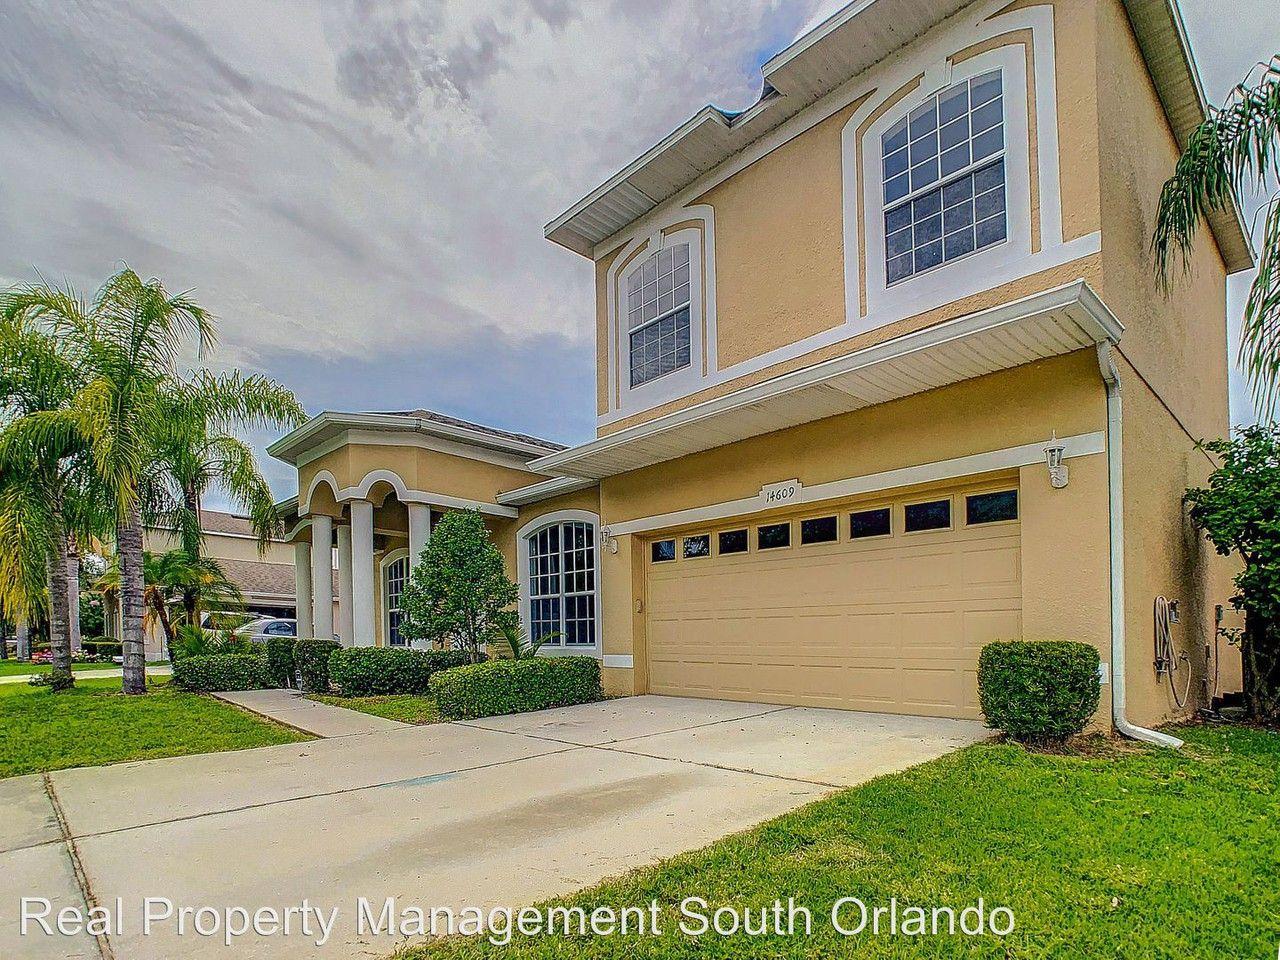 14609 Cableshire Way, Orlando, FL 32824 4 Bedroom House